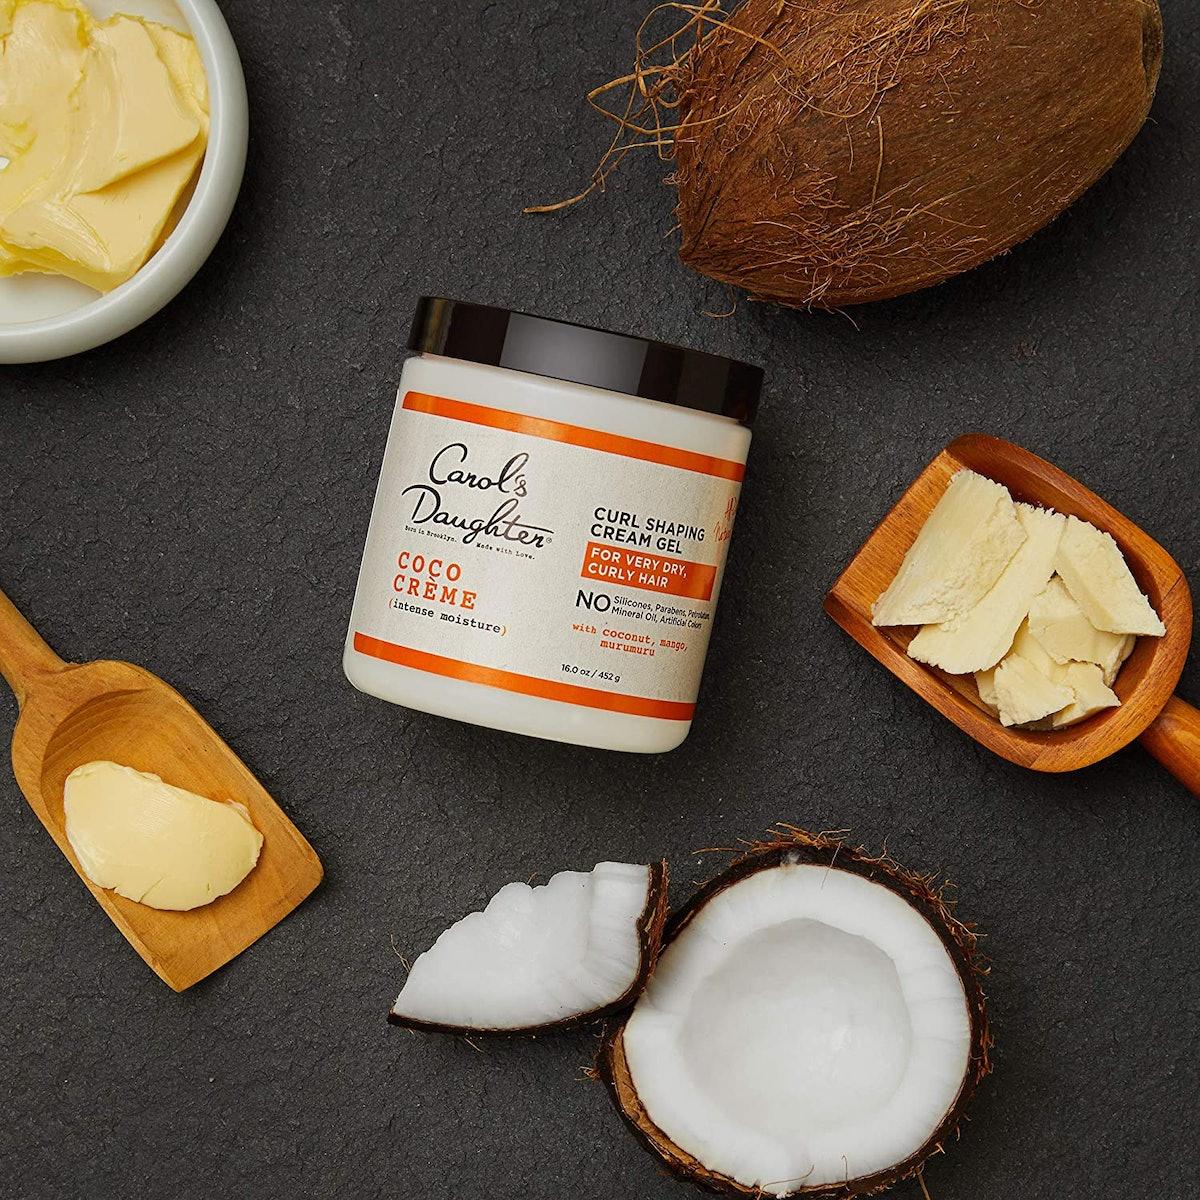 Carol's Daughter Shaping Cream Gel